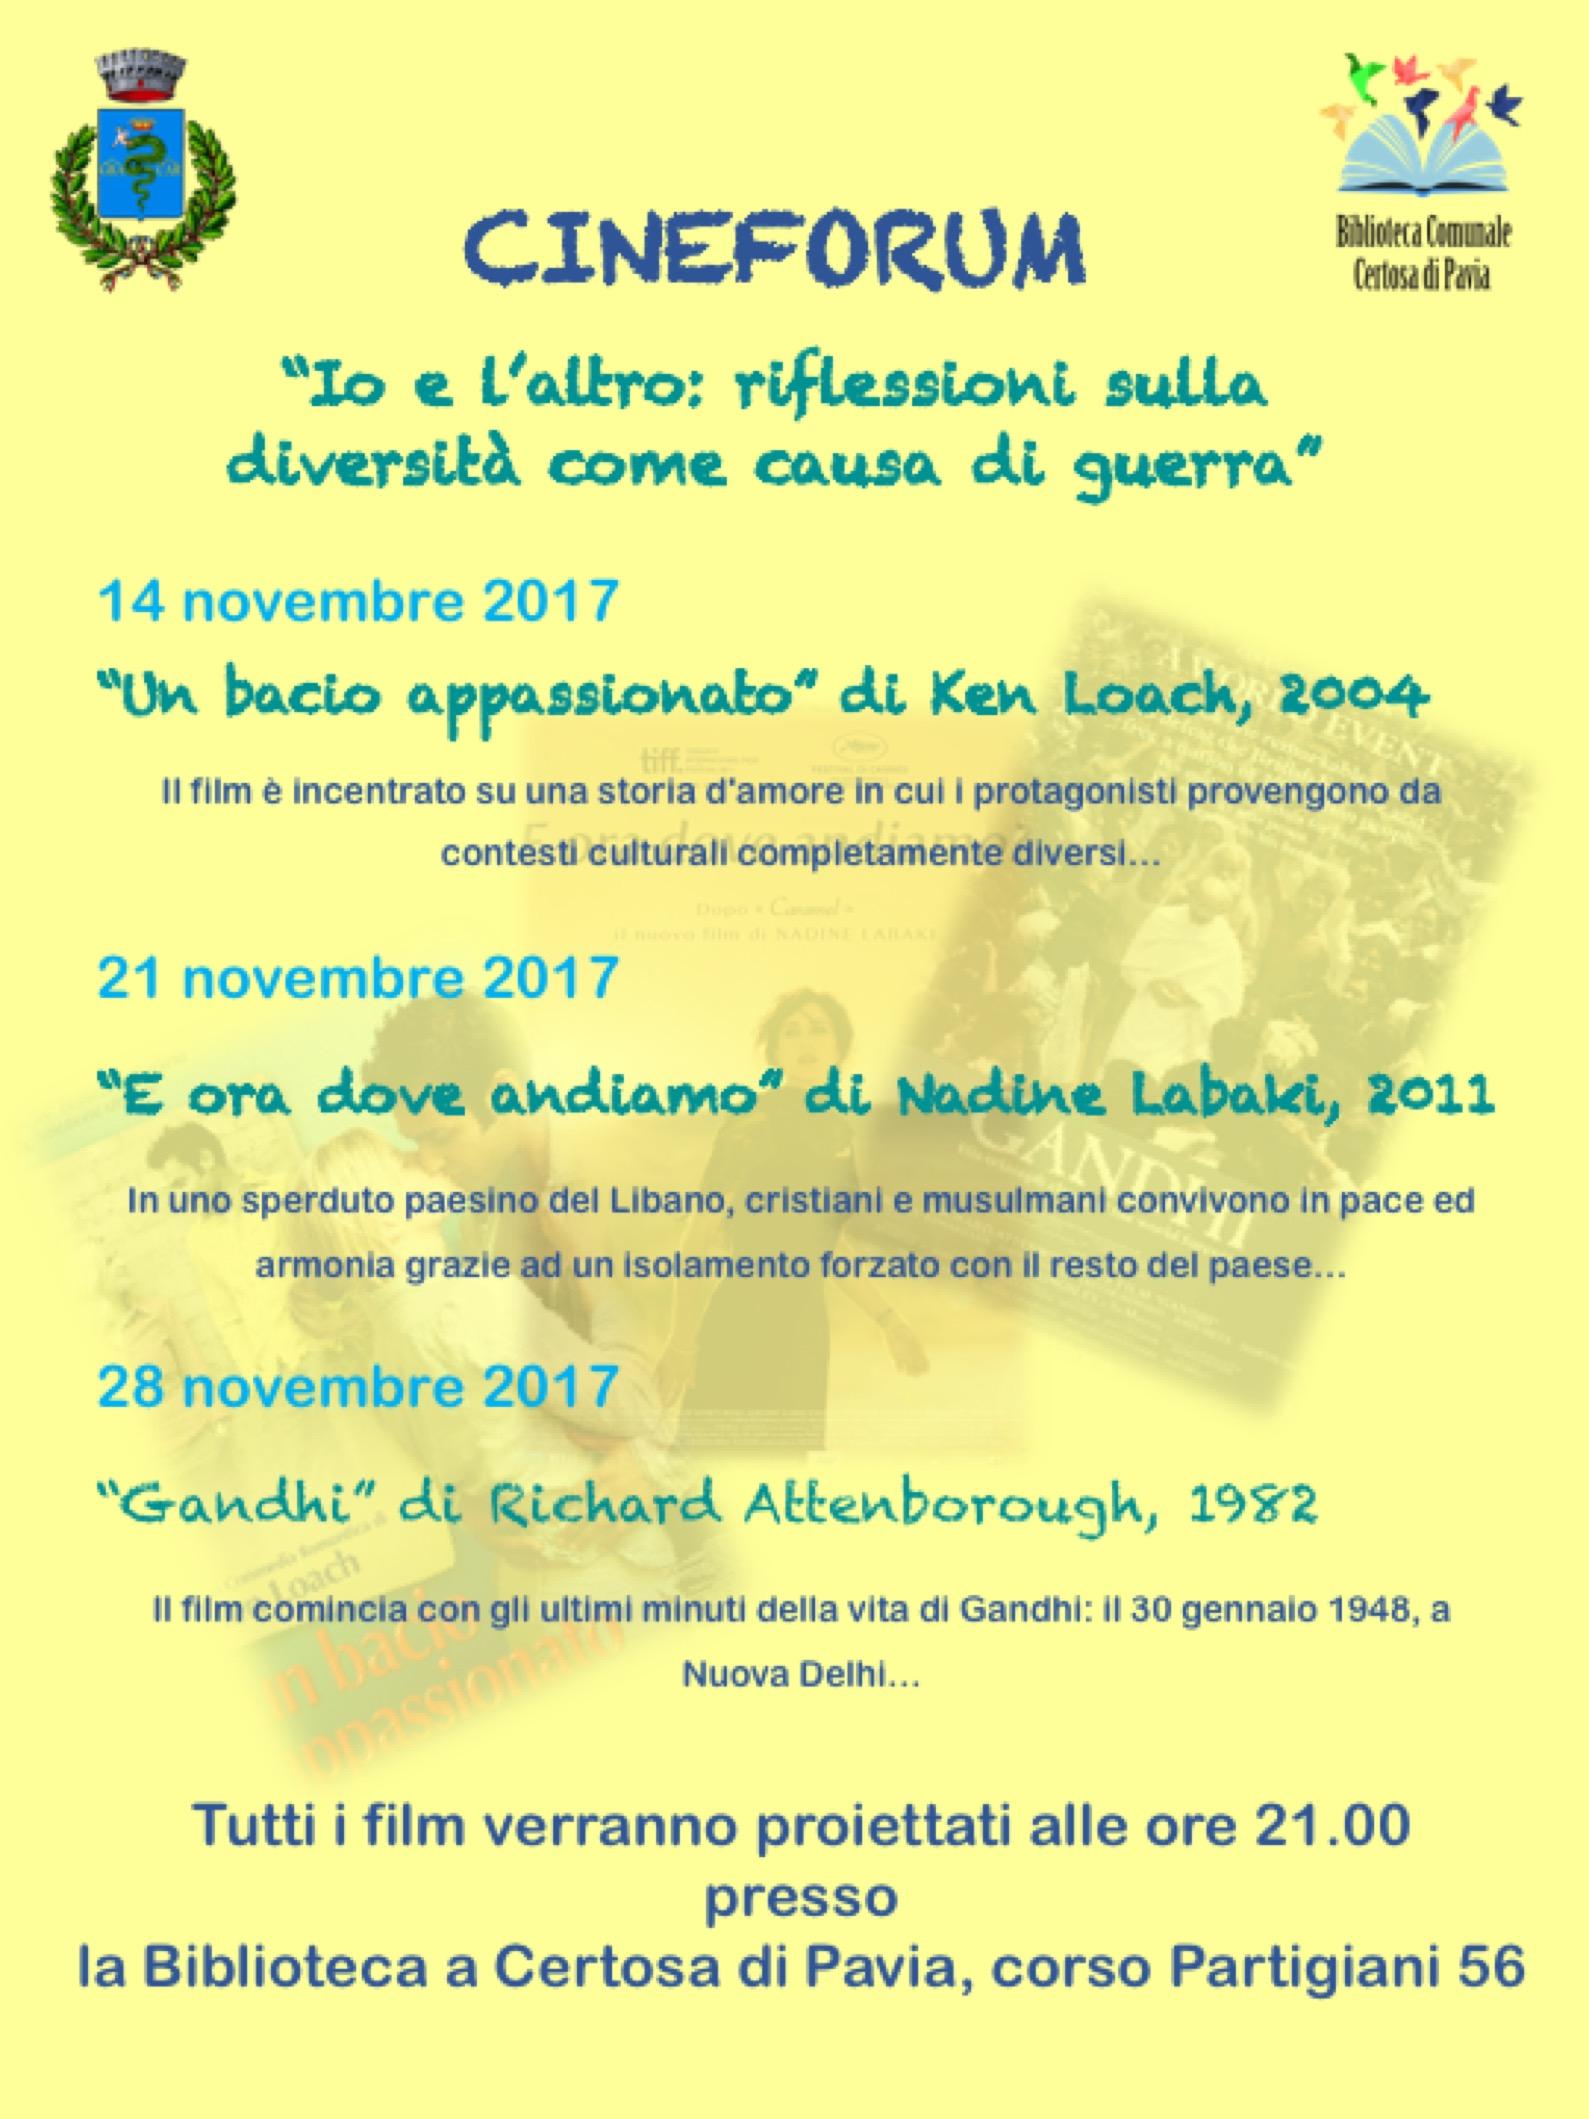 Cineforum Novembre 2017 Biblioteca di Certosa di Pavia